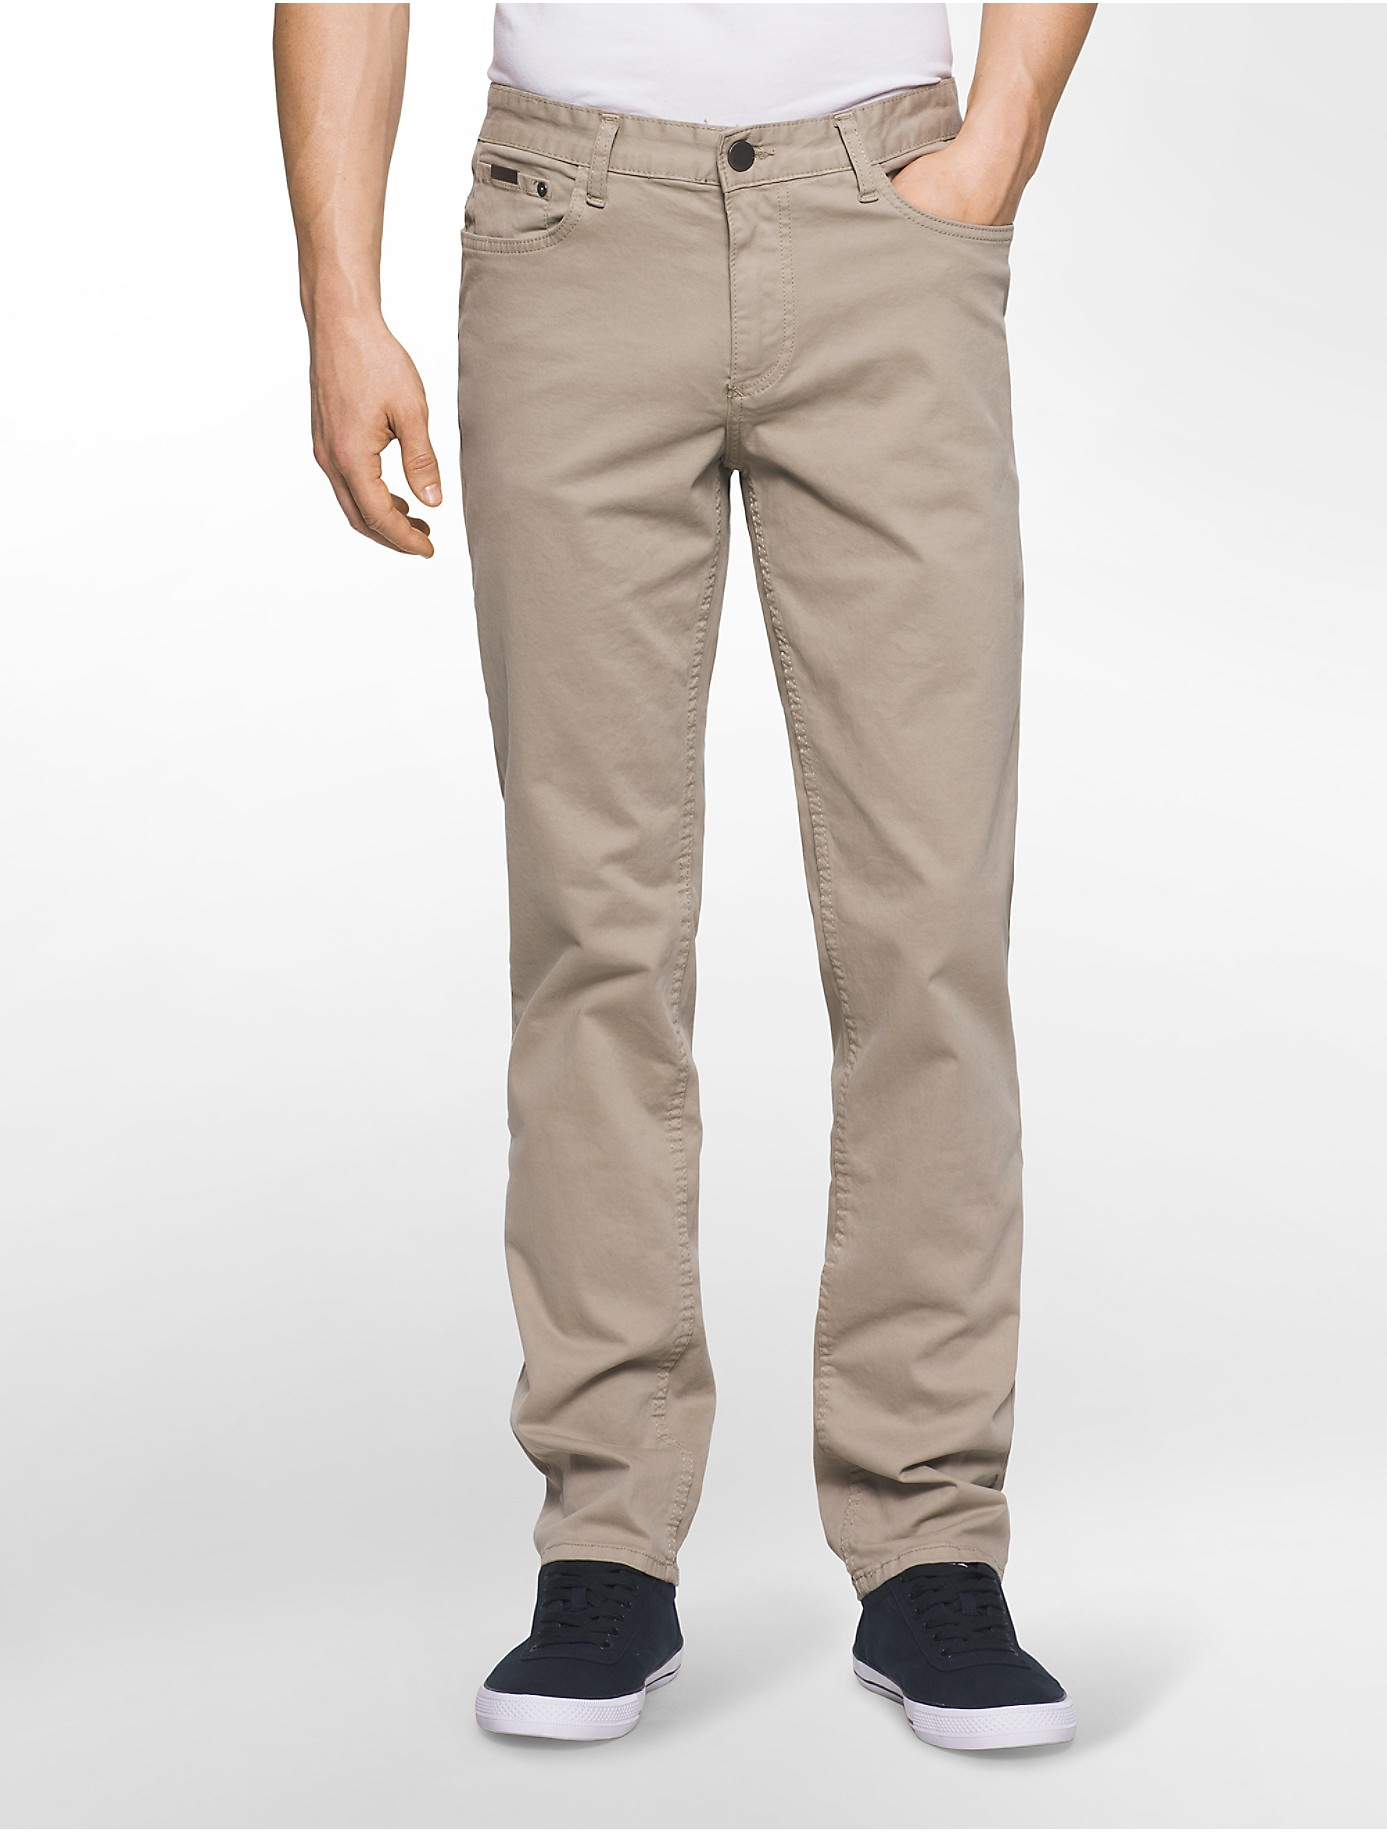 calvin klein jeans slim straight leg 5 pocket sateen pants. Black Bedroom Furniture Sets. Home Design Ideas